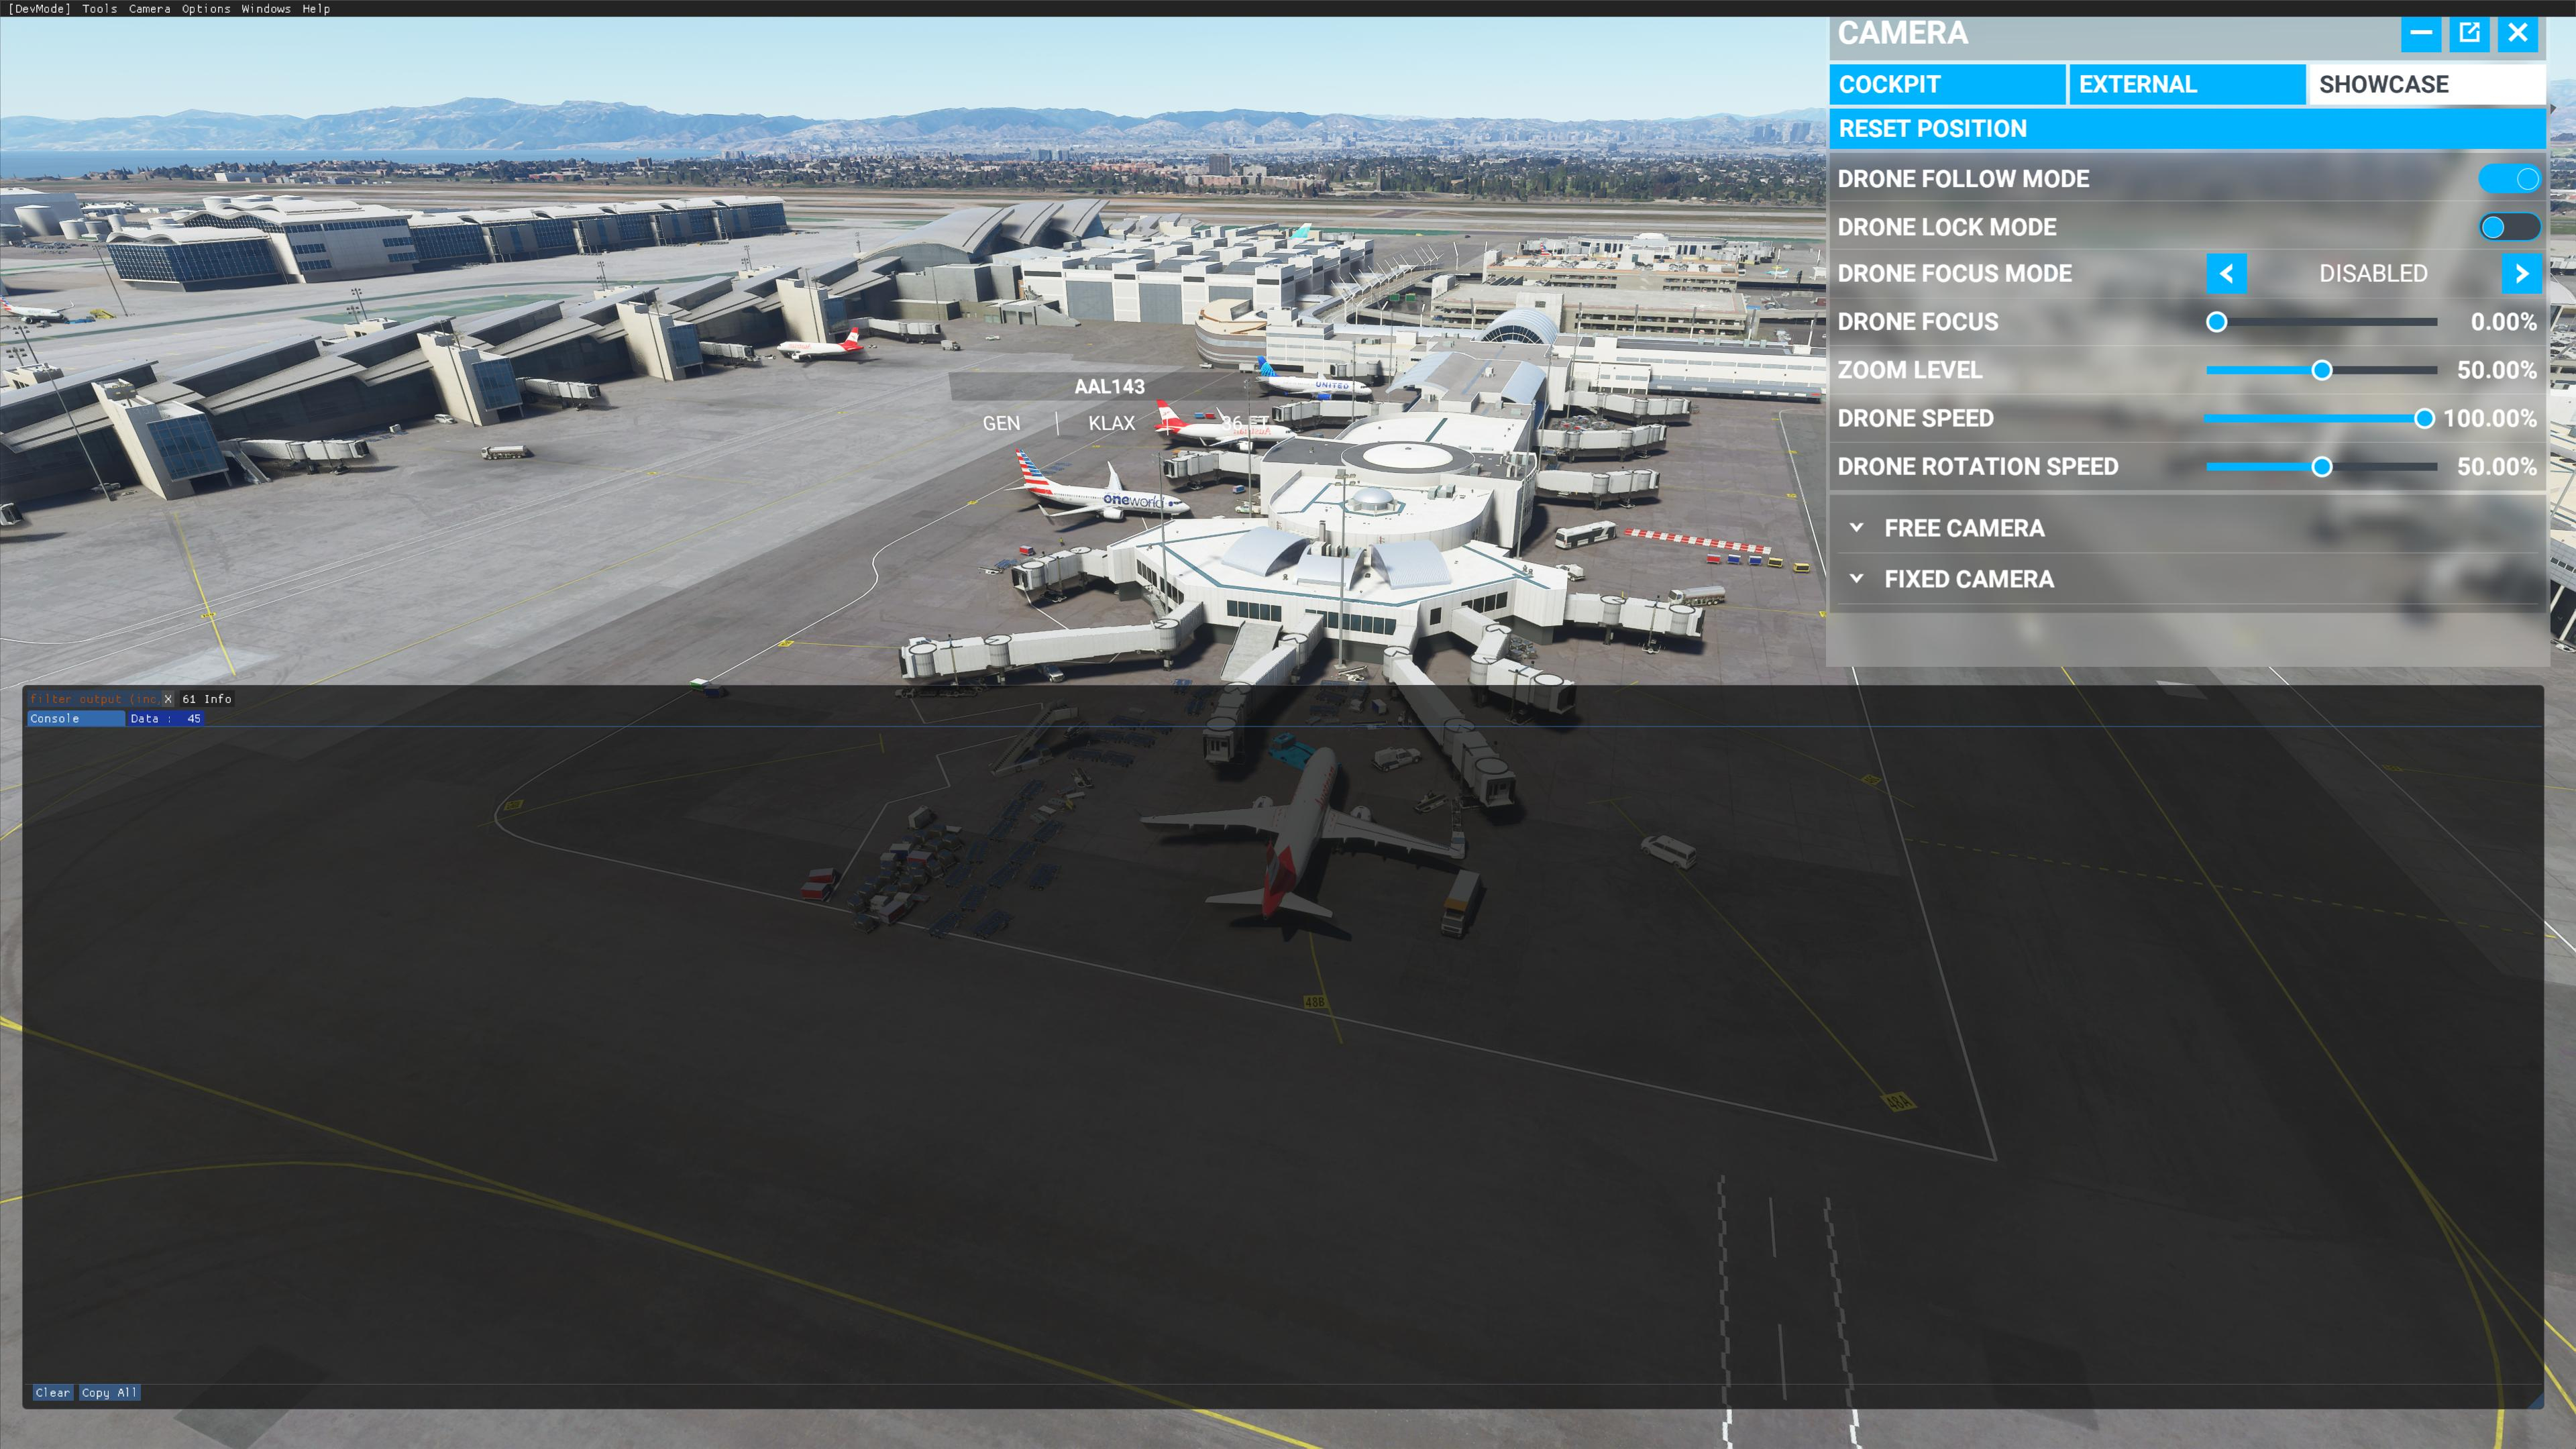 https://forums.flightsimulator.com/uploads/default/original/3X/9/e/9ec5c85b047ecfb394084a9fe324947fe6038c22.jpeg